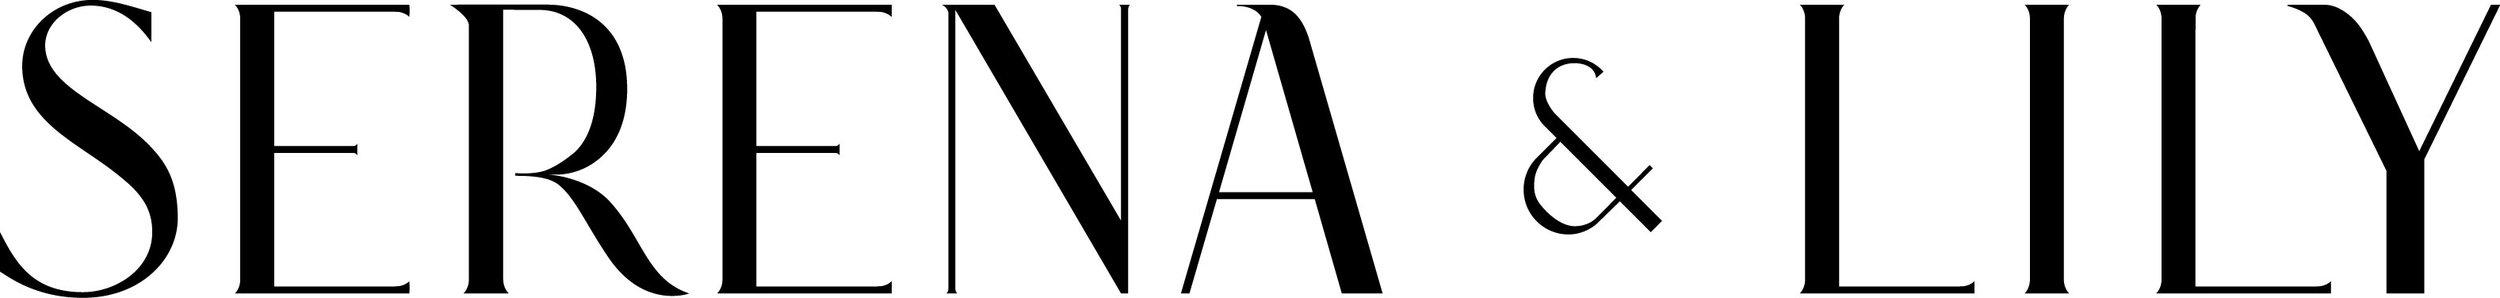 Serena-Lily-Logo-High-Res.jpg